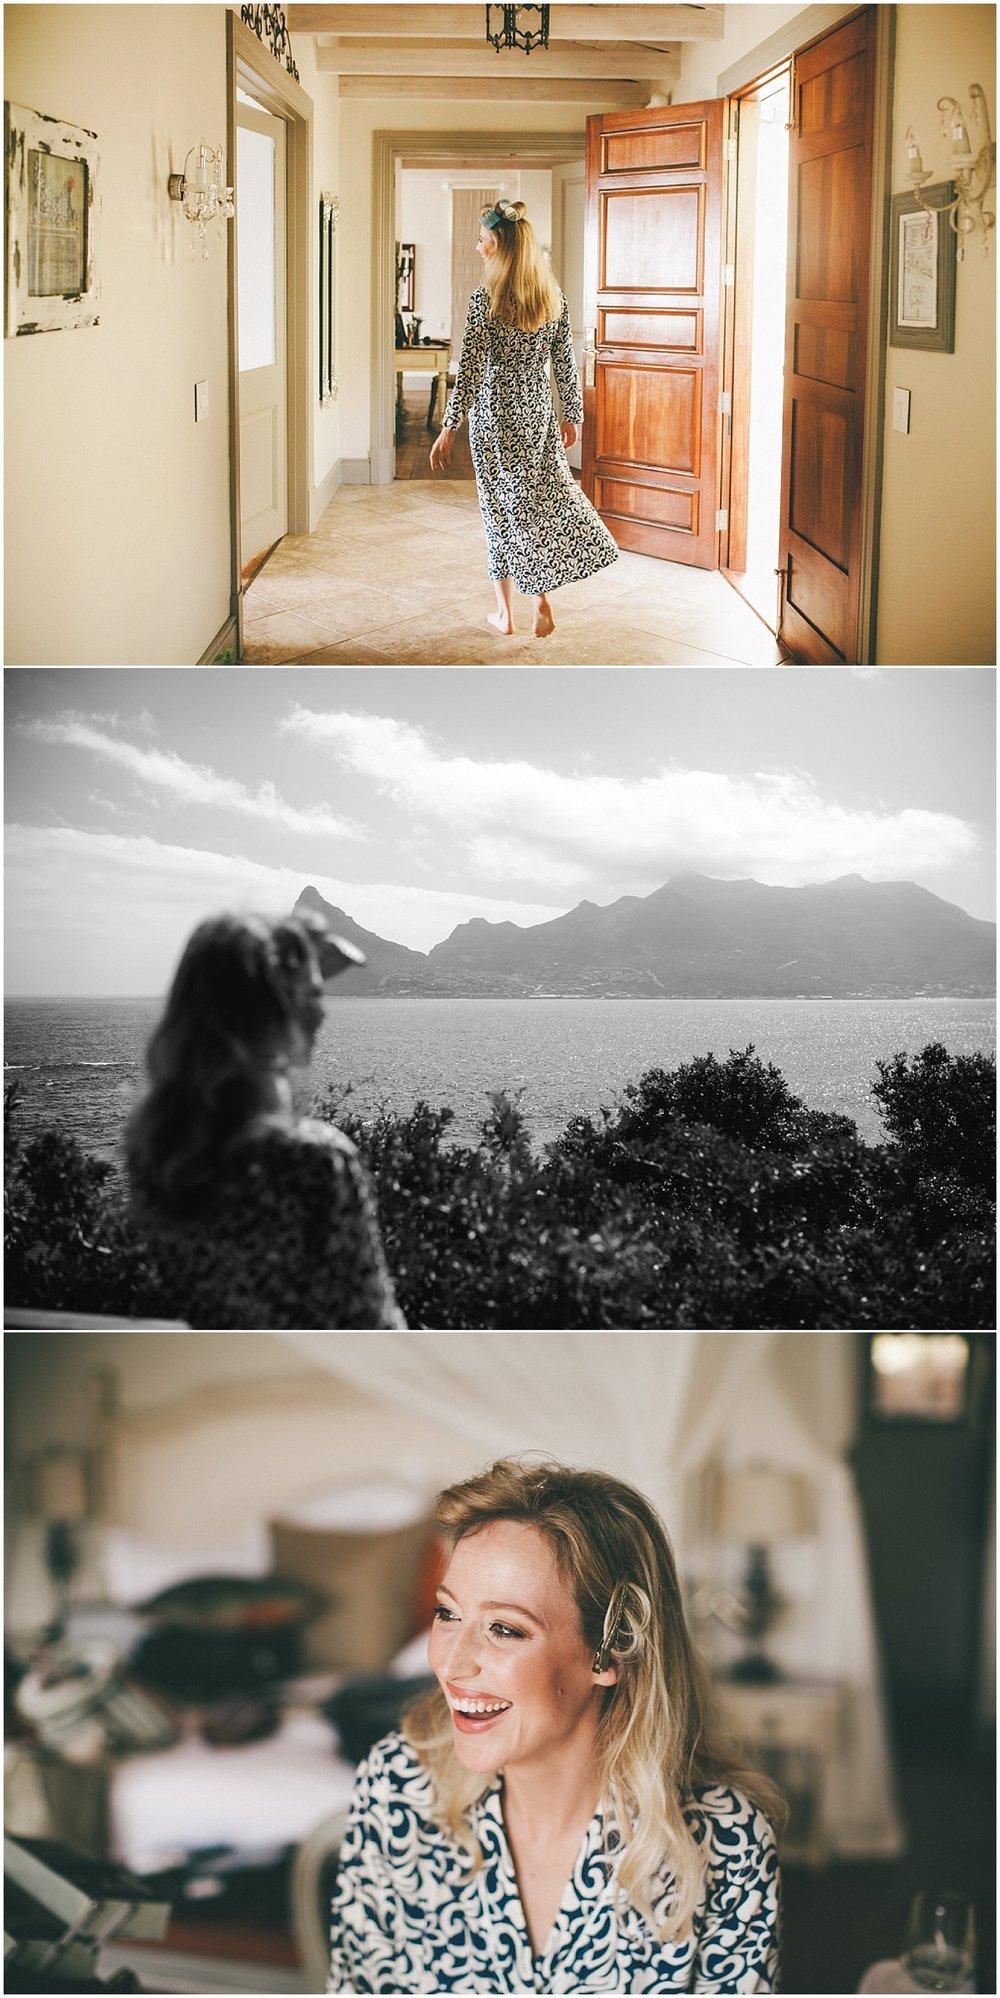 K&M_Fiona Clair-31.jpg